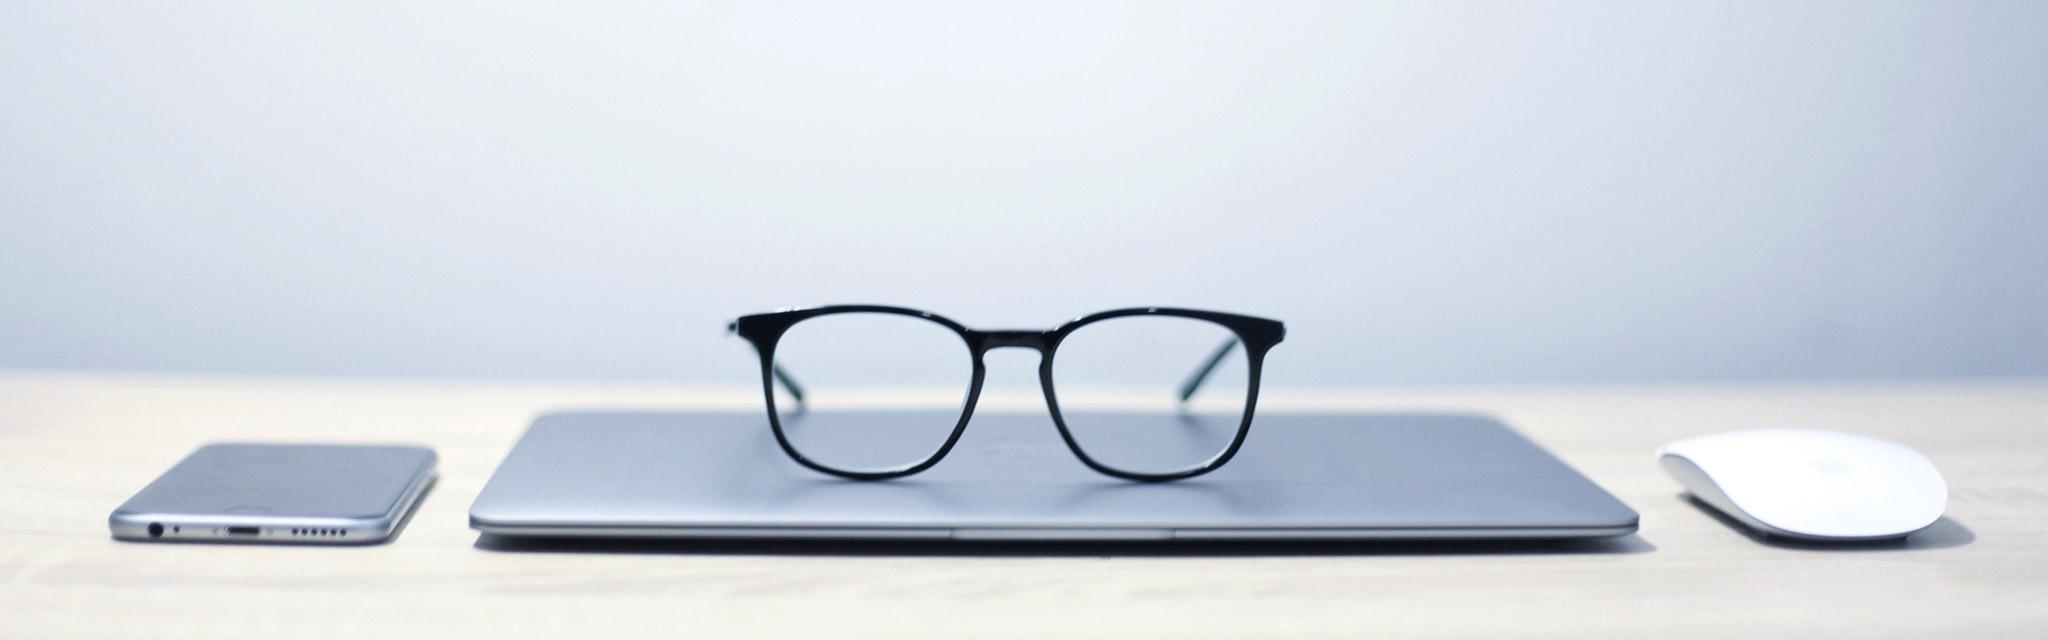 Spray occhiali e schermi